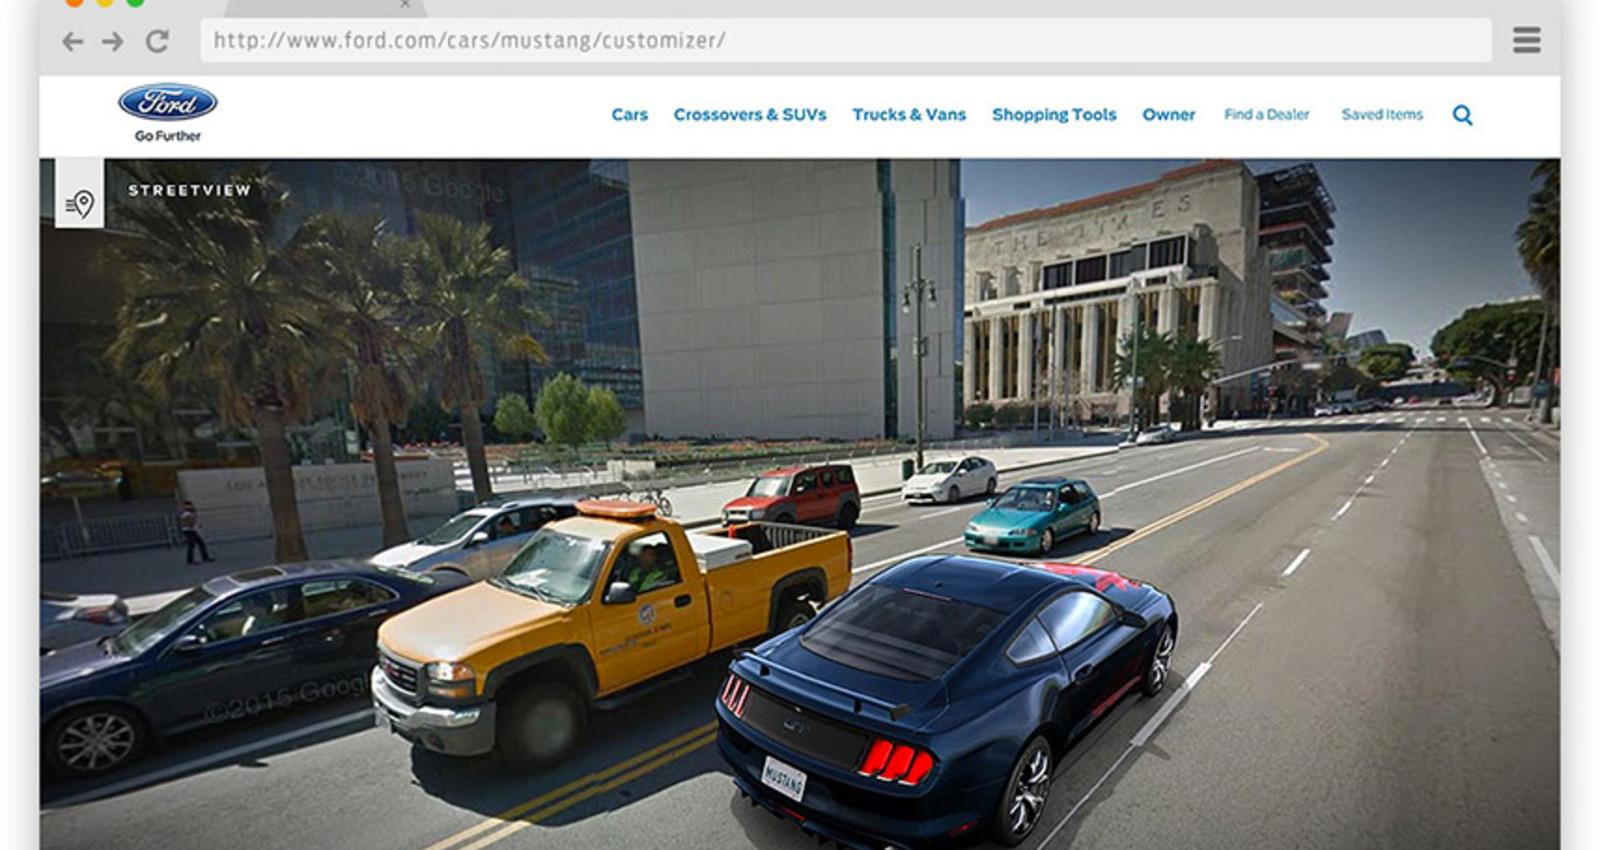 The 2015 Mustang Customizer